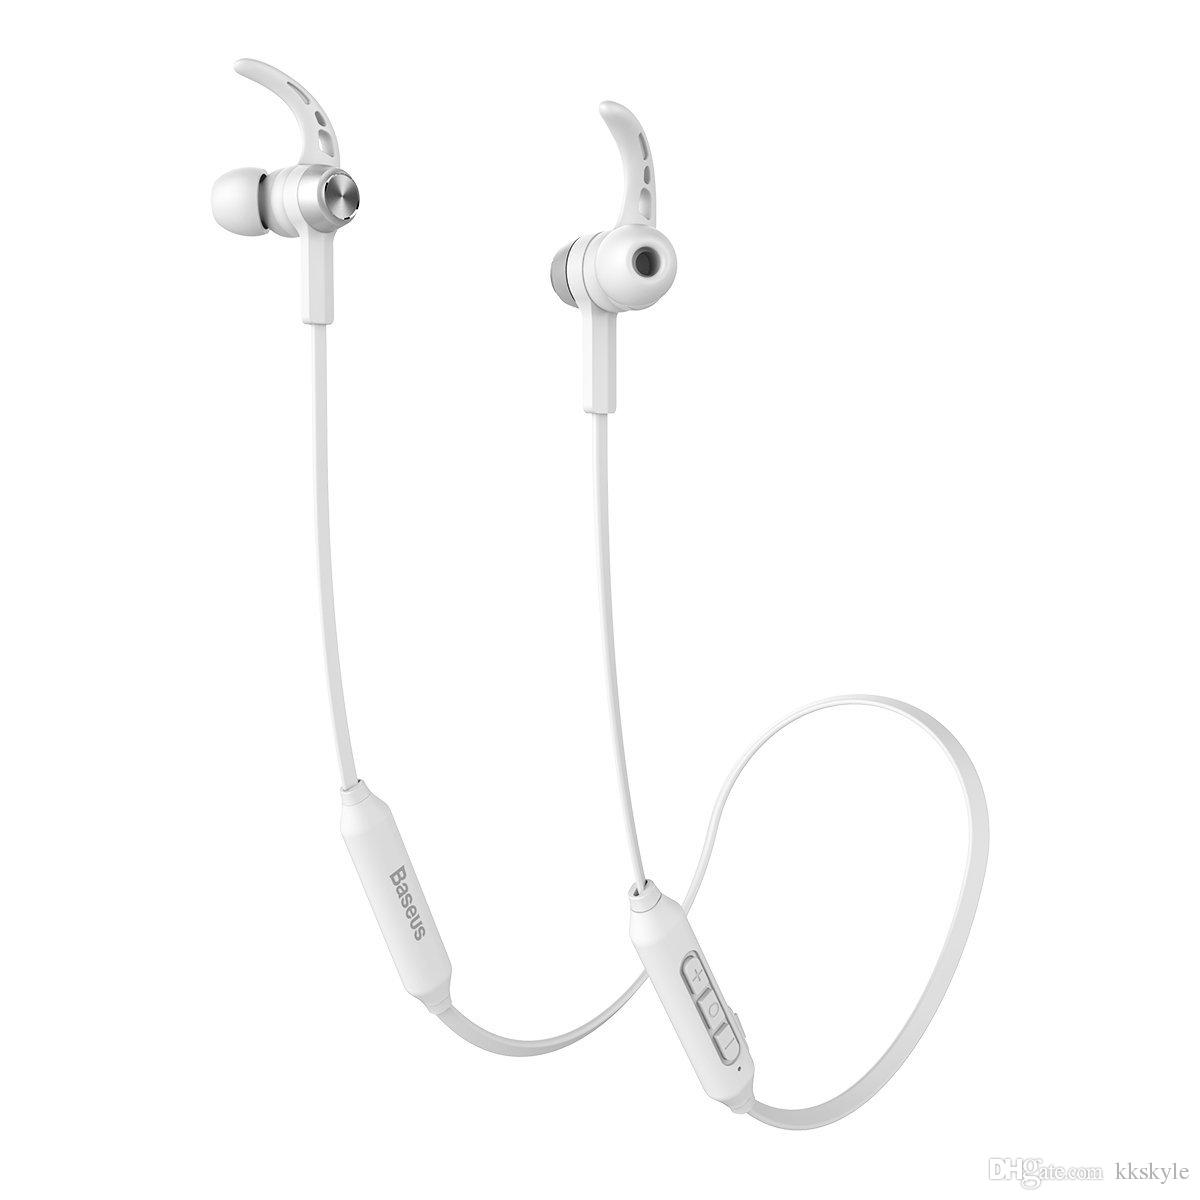 Magnetic Sport Headphones,Wireless Earphone Stereo